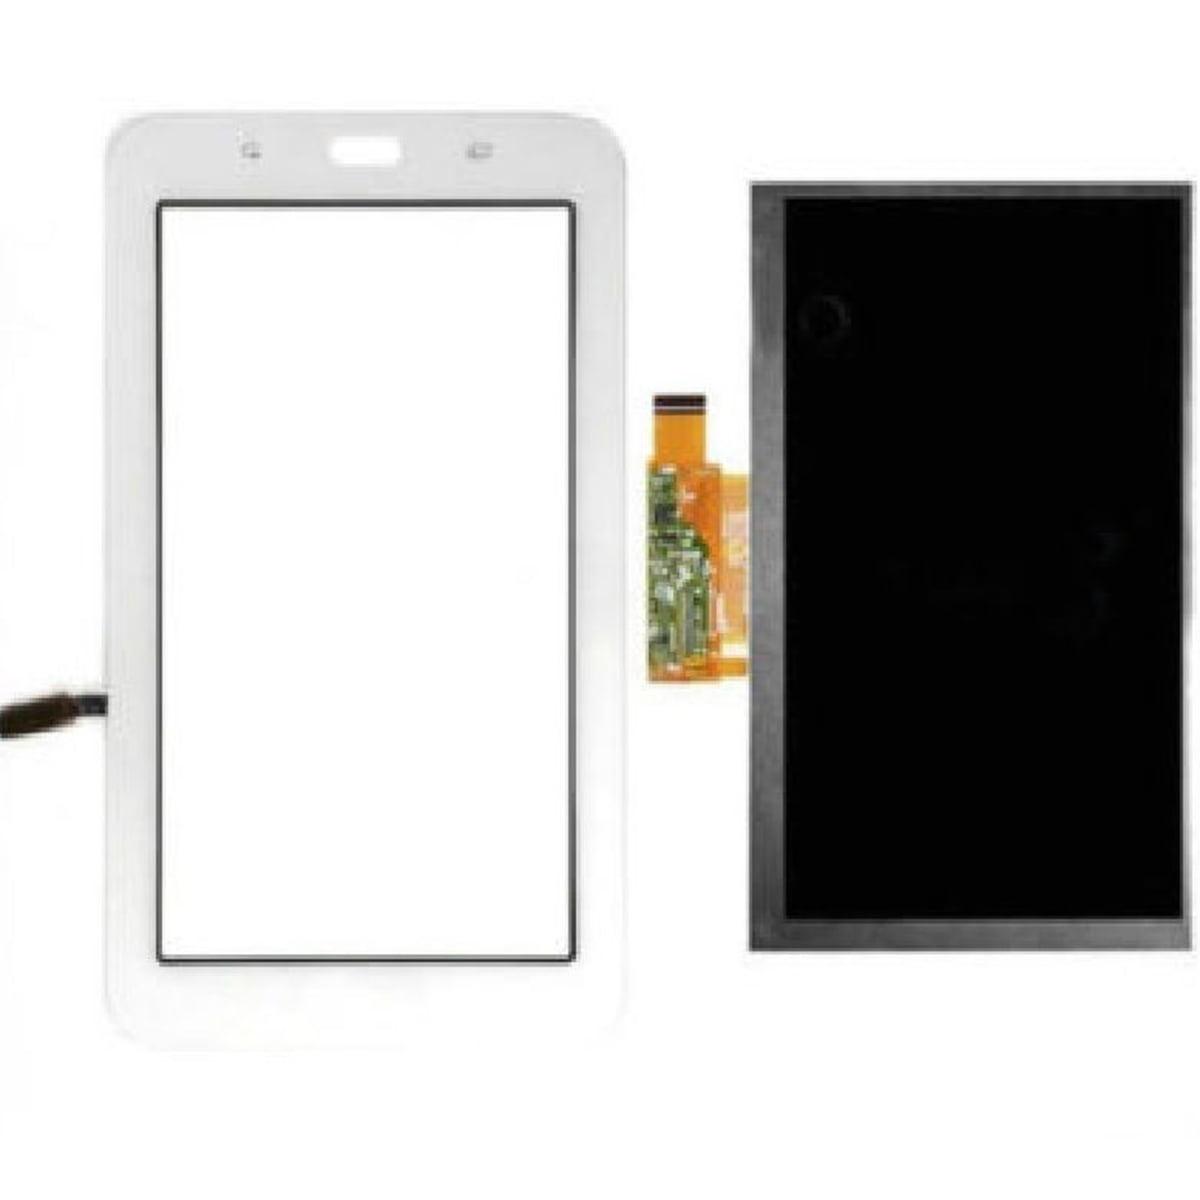 Samsung Galaxy Tab 3 Lite SM-T110 7.0 Touch Screen Digitizer White